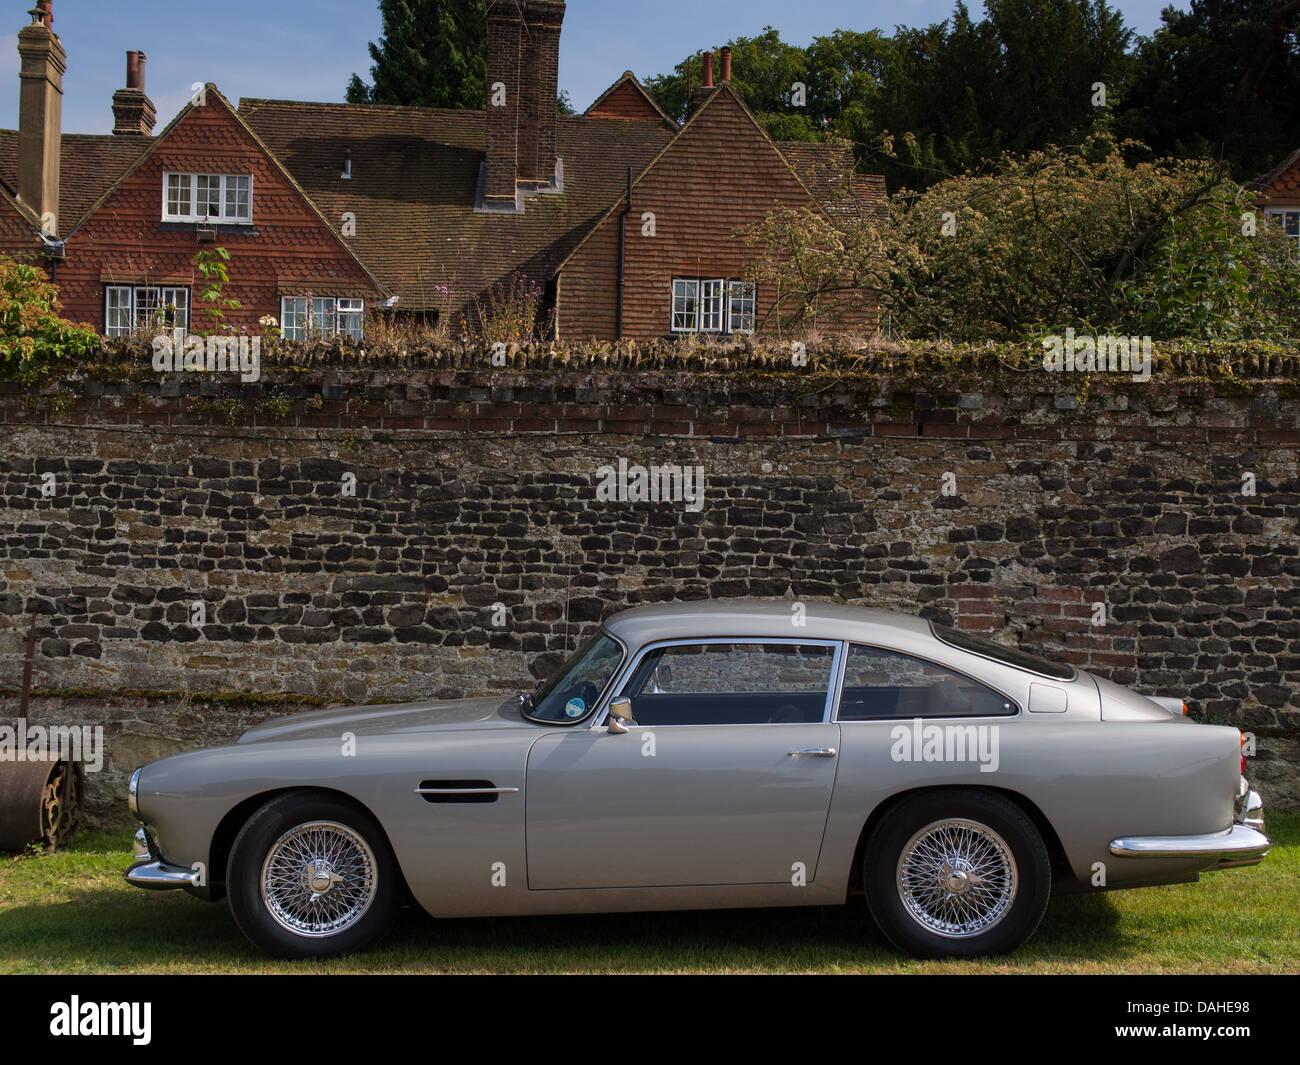 Aston Martin DB4 - Stock Image